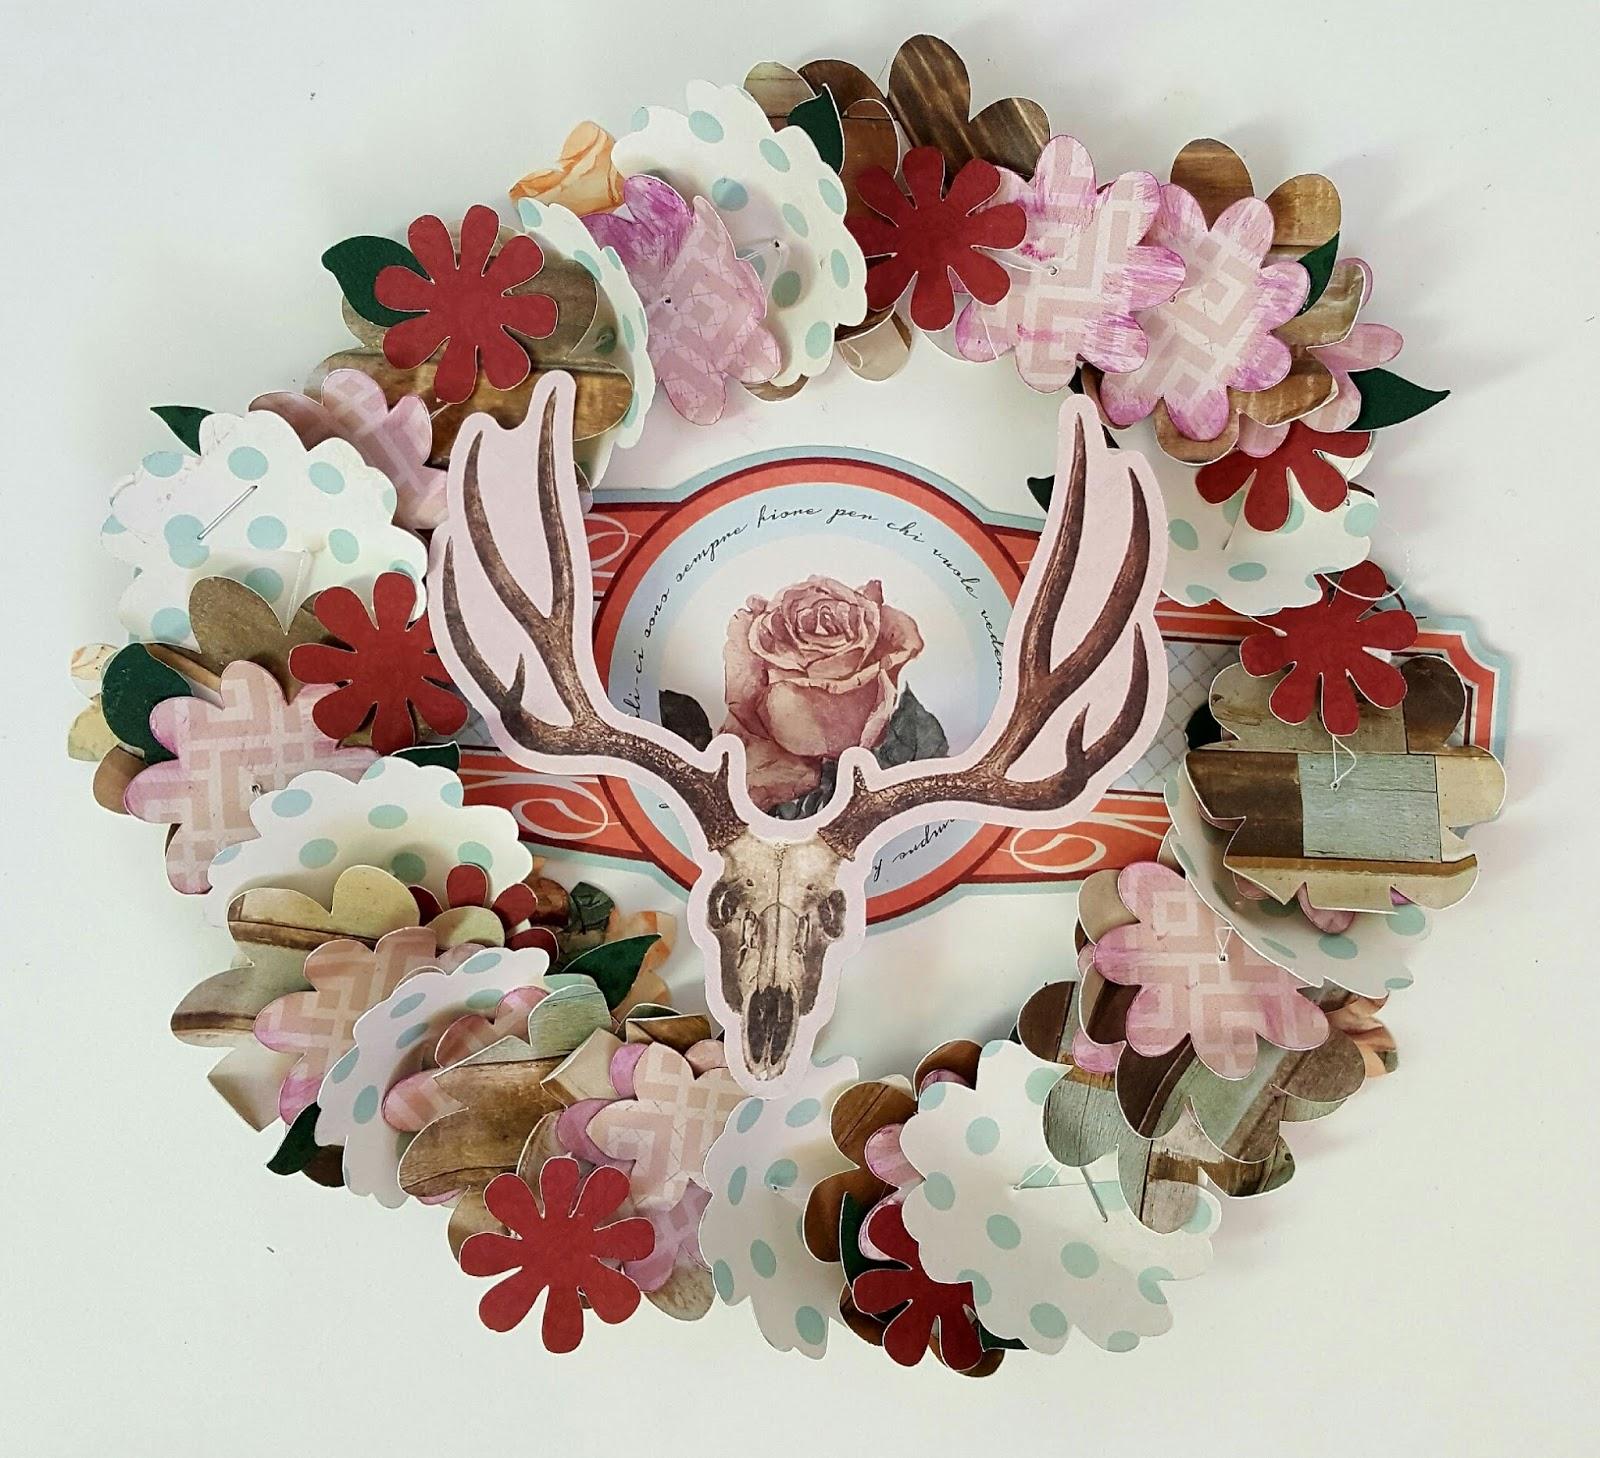 bobunny party wreath with bella rosa. Black Bedroom Furniture Sets. Home Design Ideas